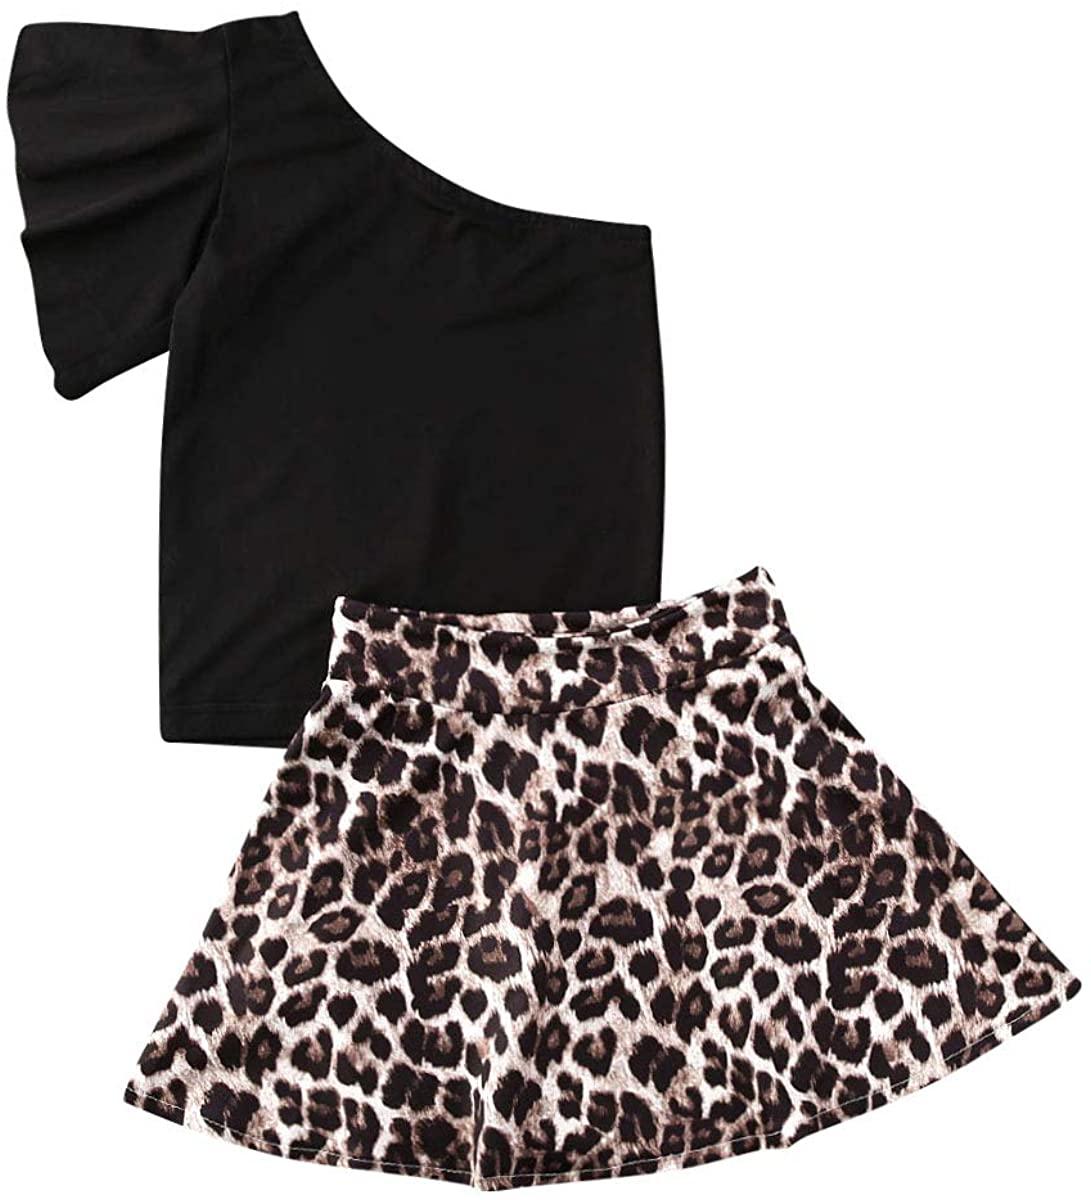 Baby Girl 2PCS Outfits Black Off Shoulder Top+Leopard Print Skirt Set Summer Party Clothes Sets